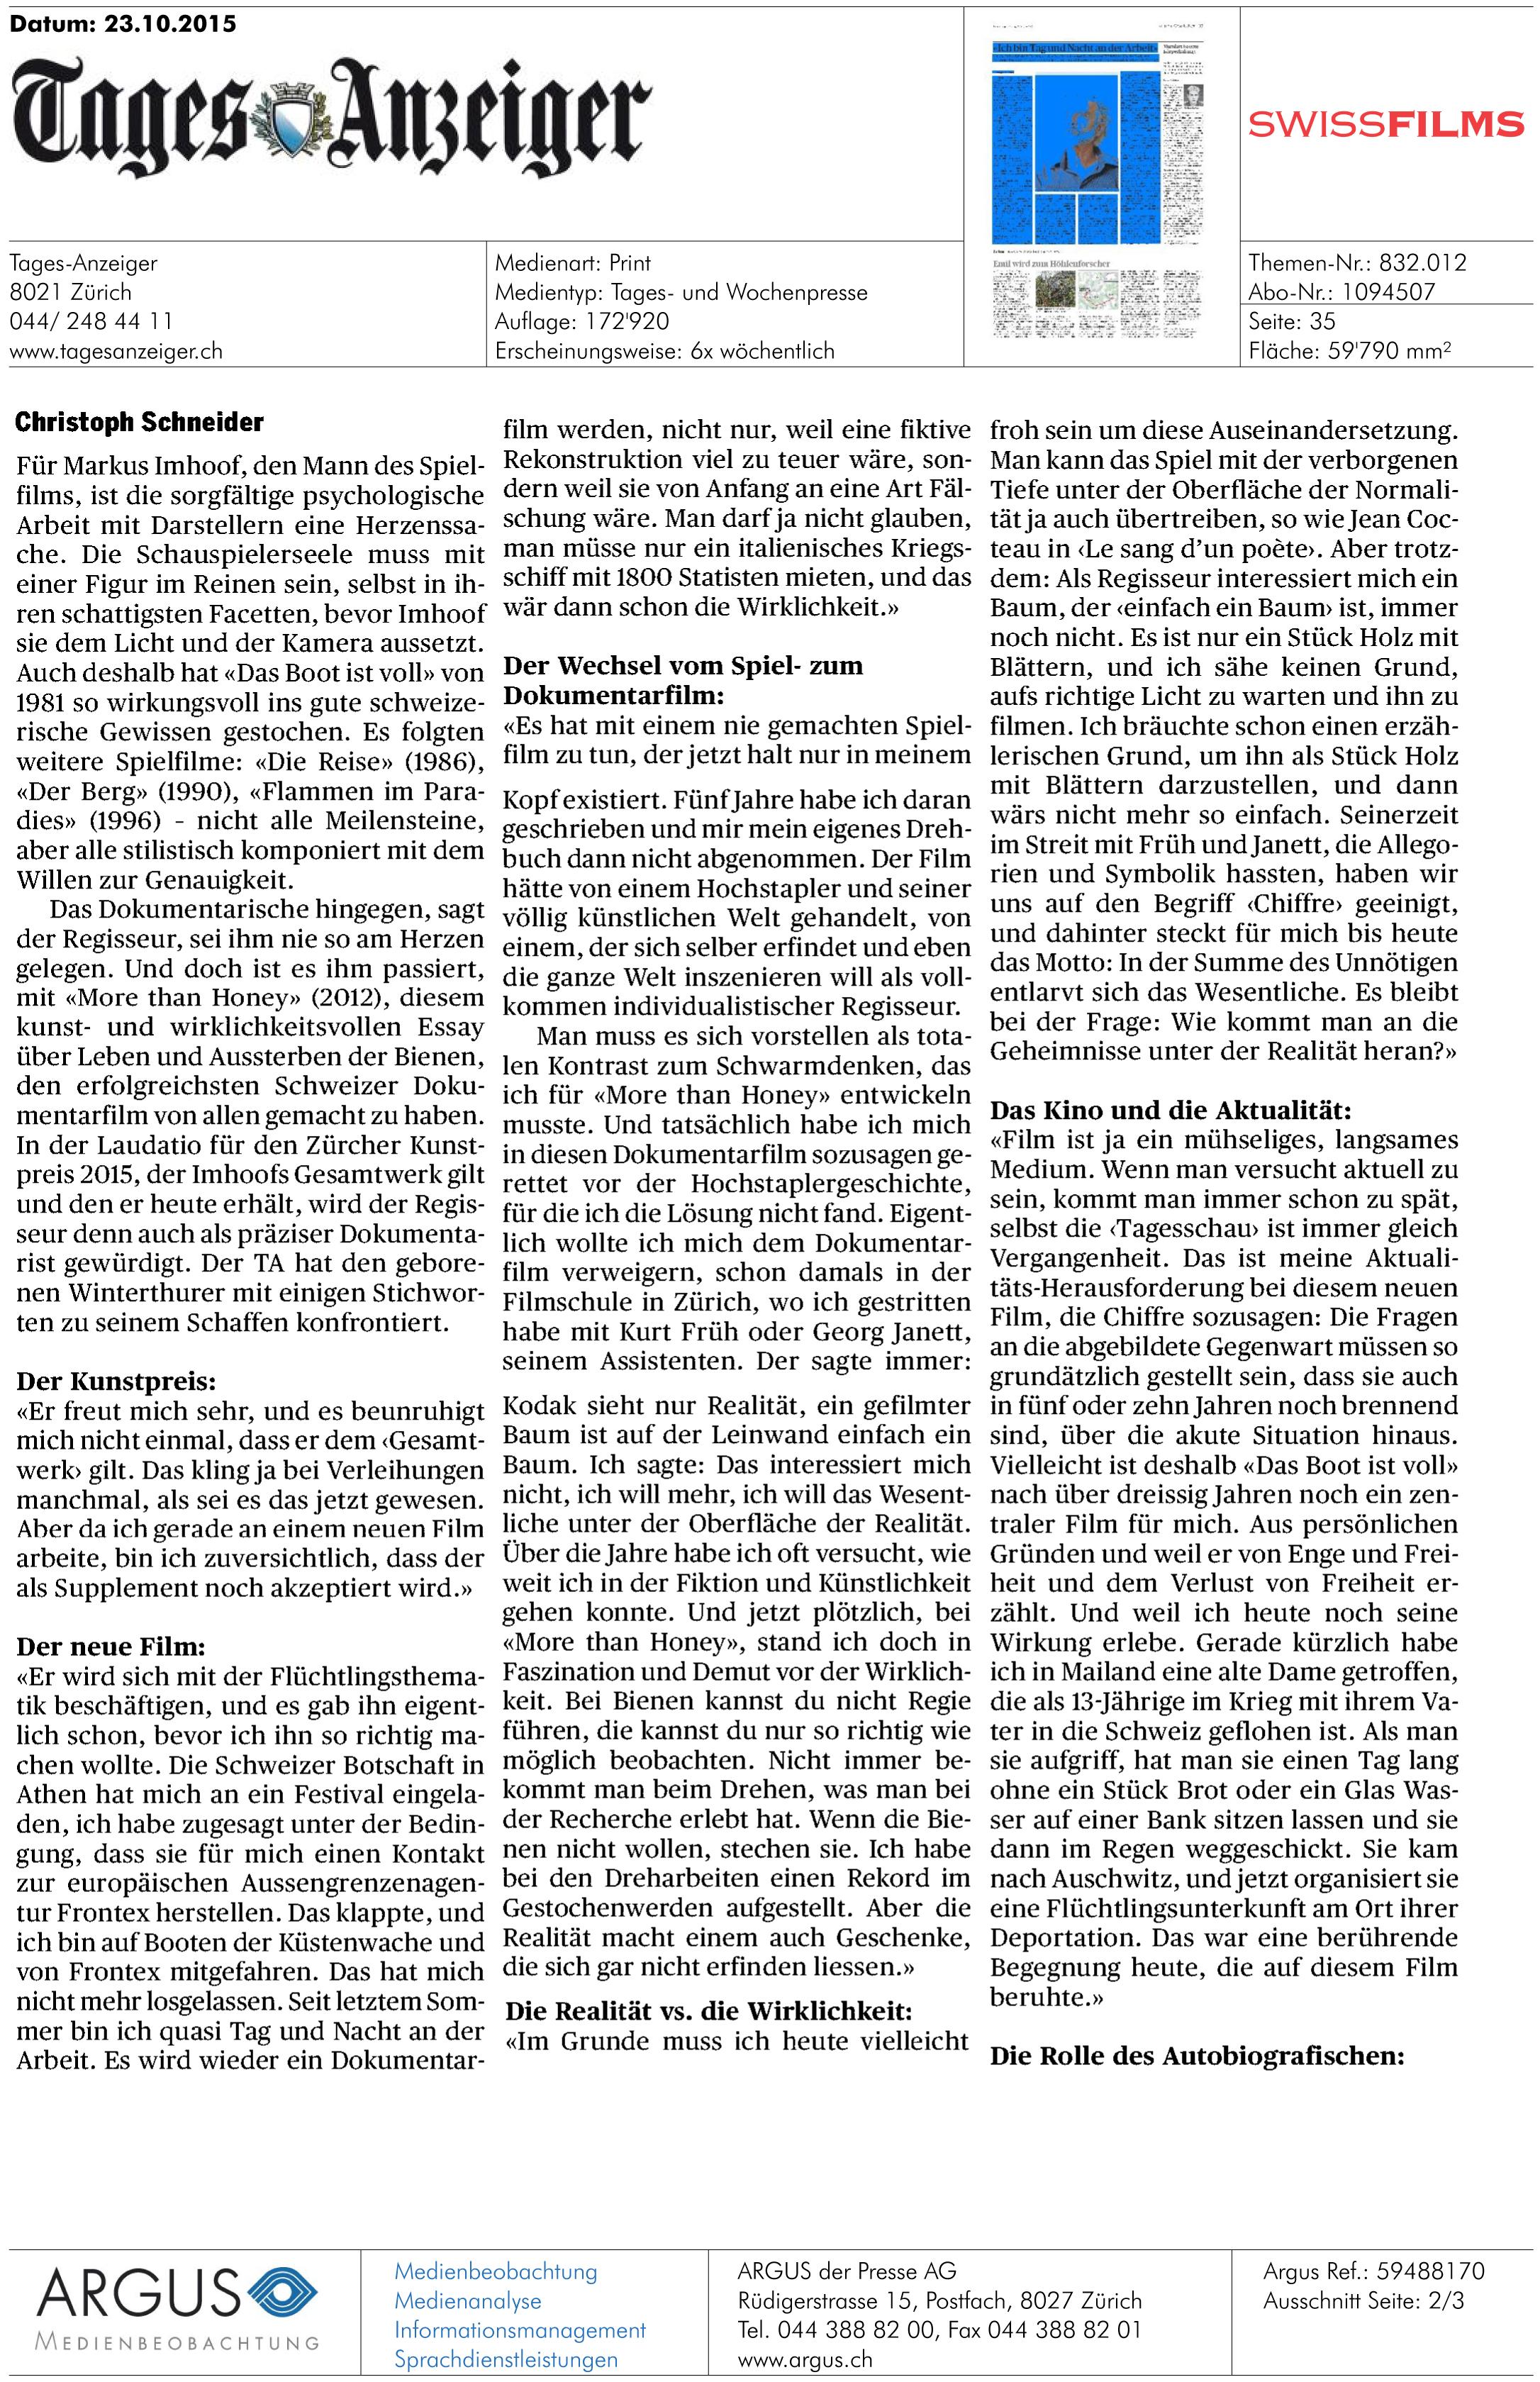 Eldorado - Tages Anzeiger 23.10 p2